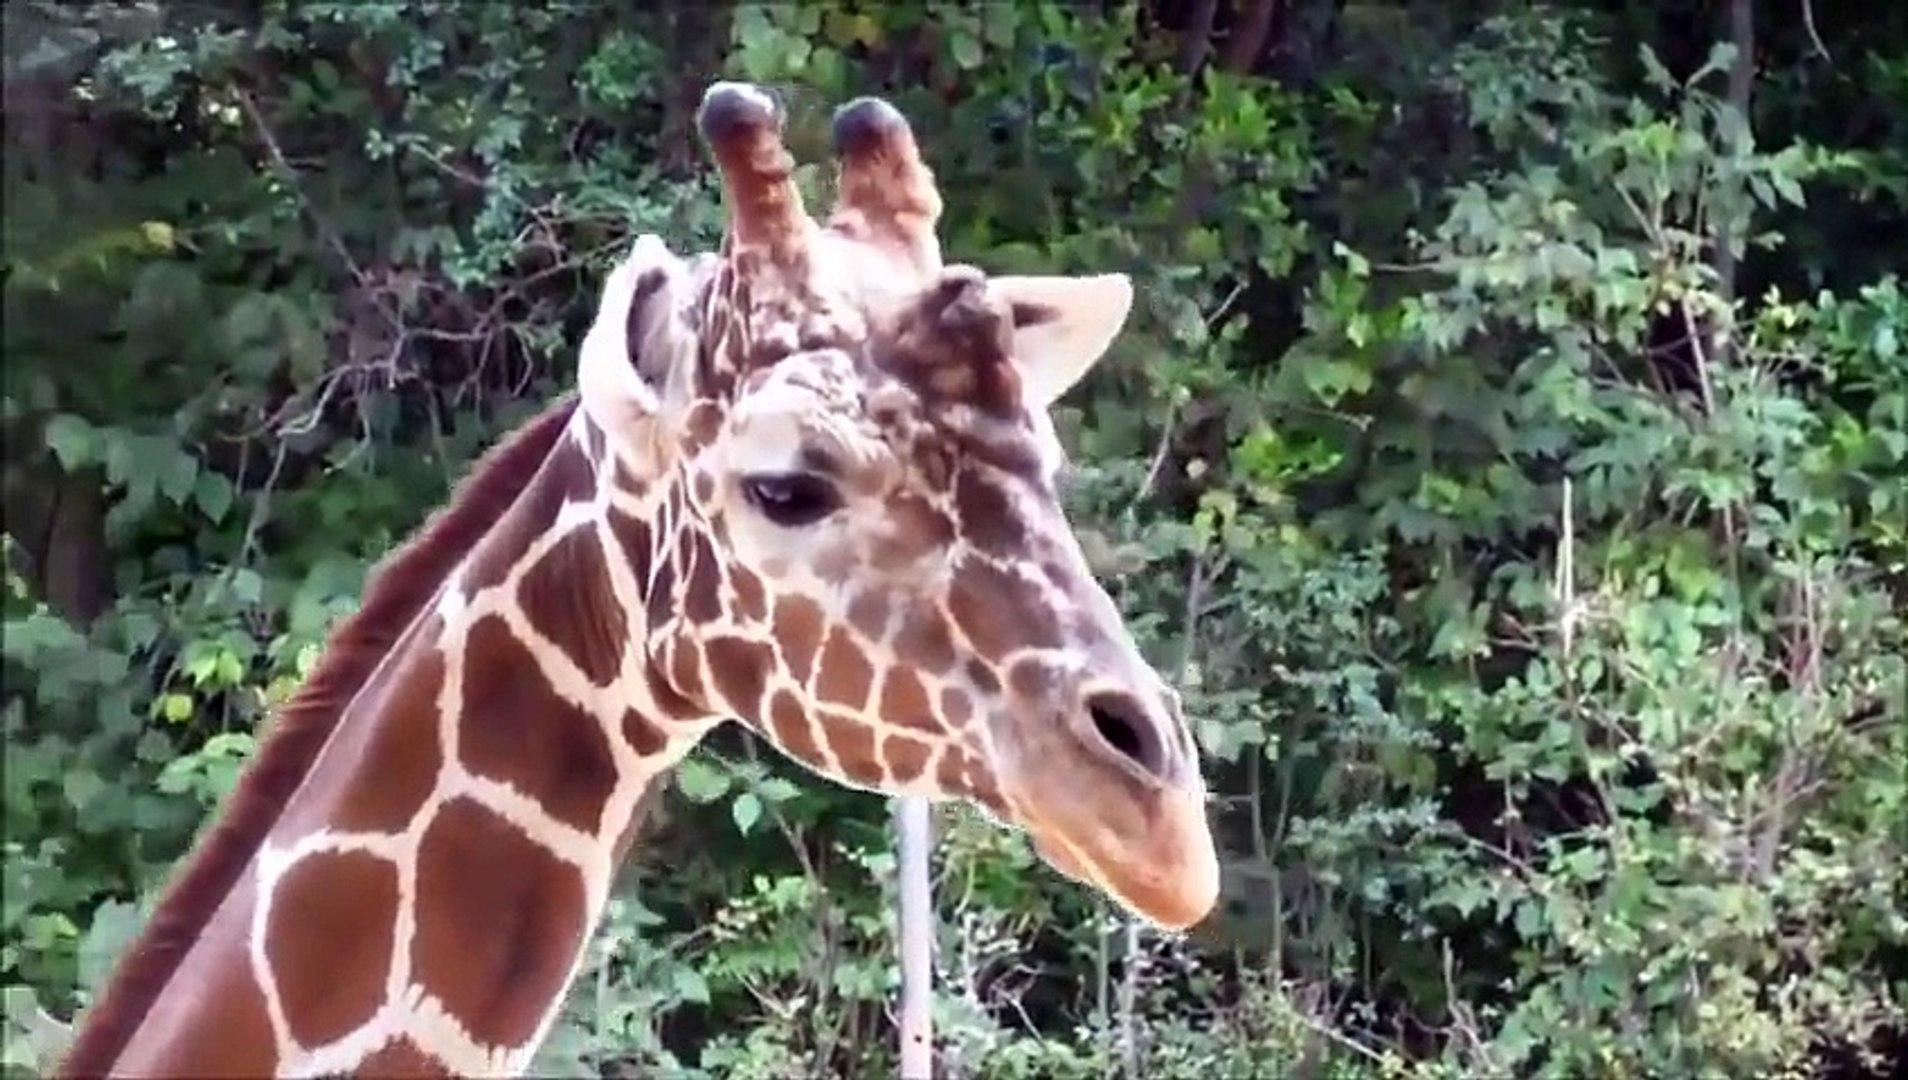 LOL Hot animal mating crazy videos funny video 2014 Part34 wild sex animal sex animal